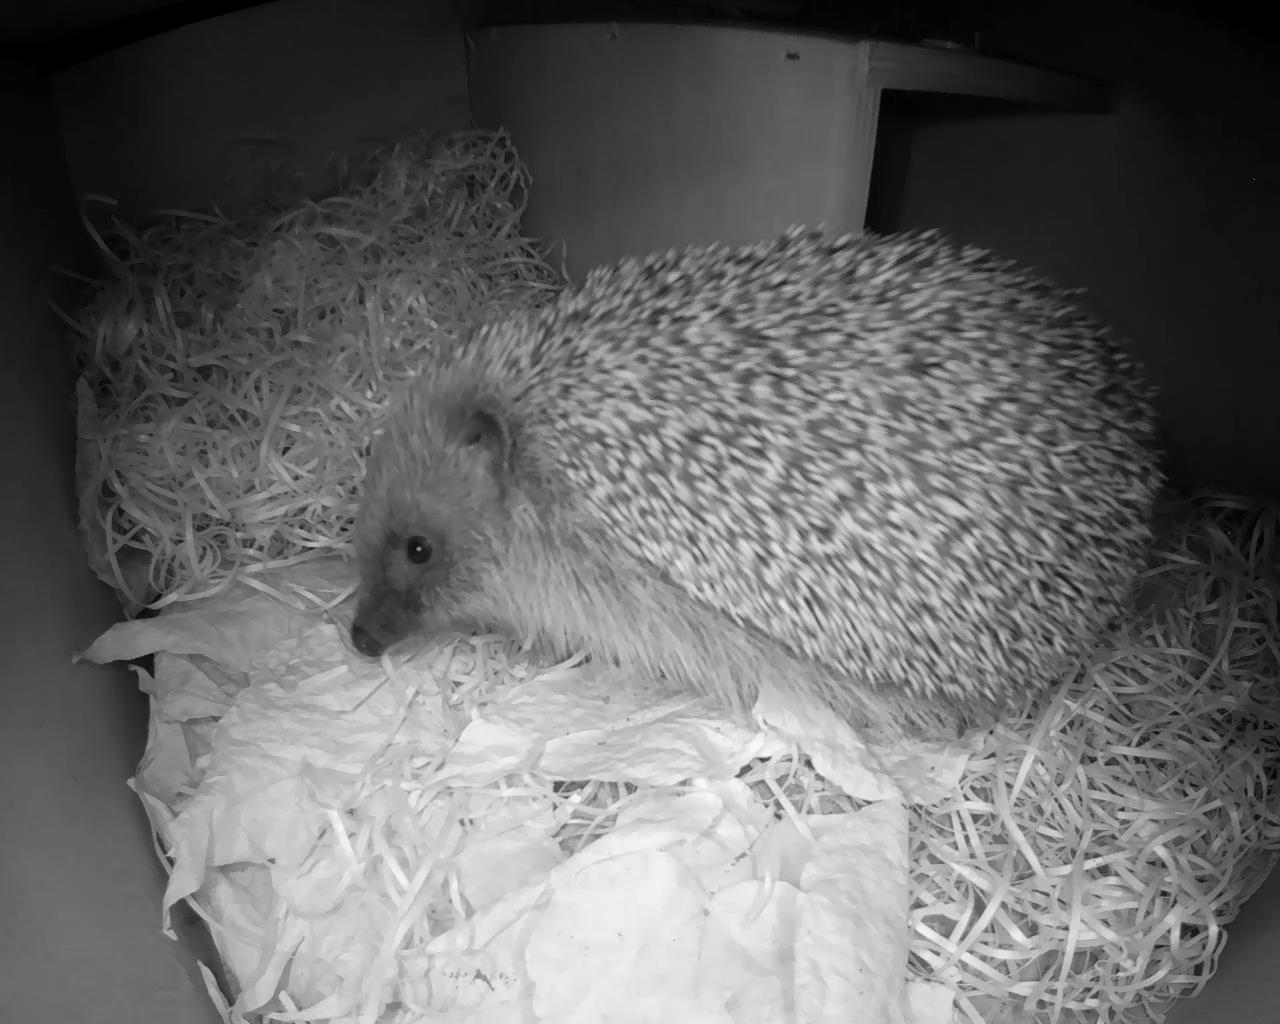 Hedgehog Box 2016-04-17 21-12-16.606